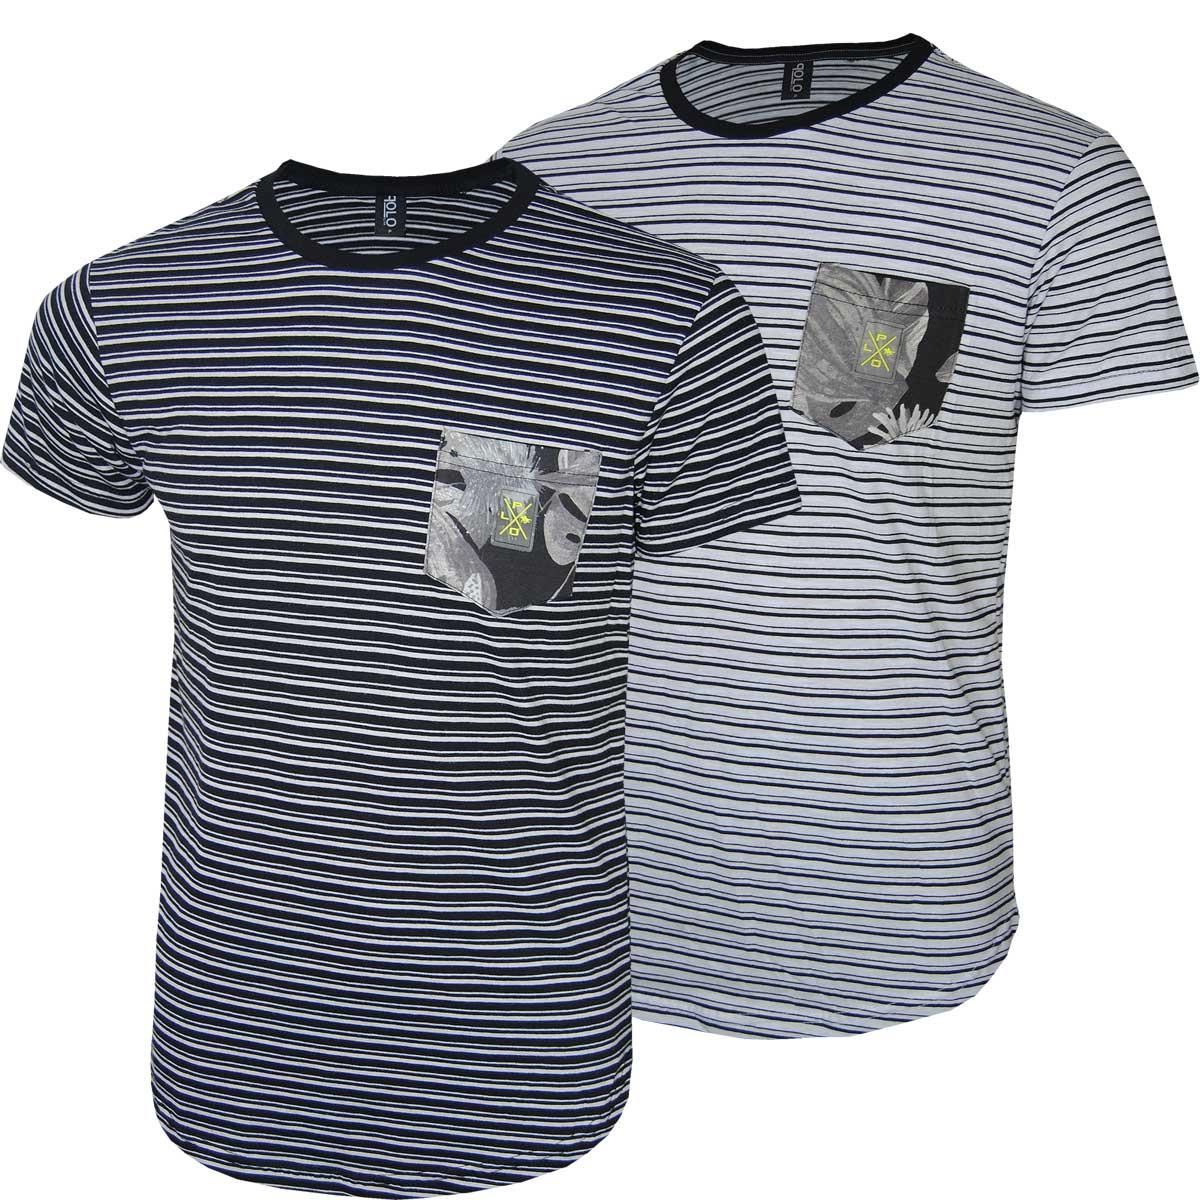 Kit Masculino Camisetas Swag Listras